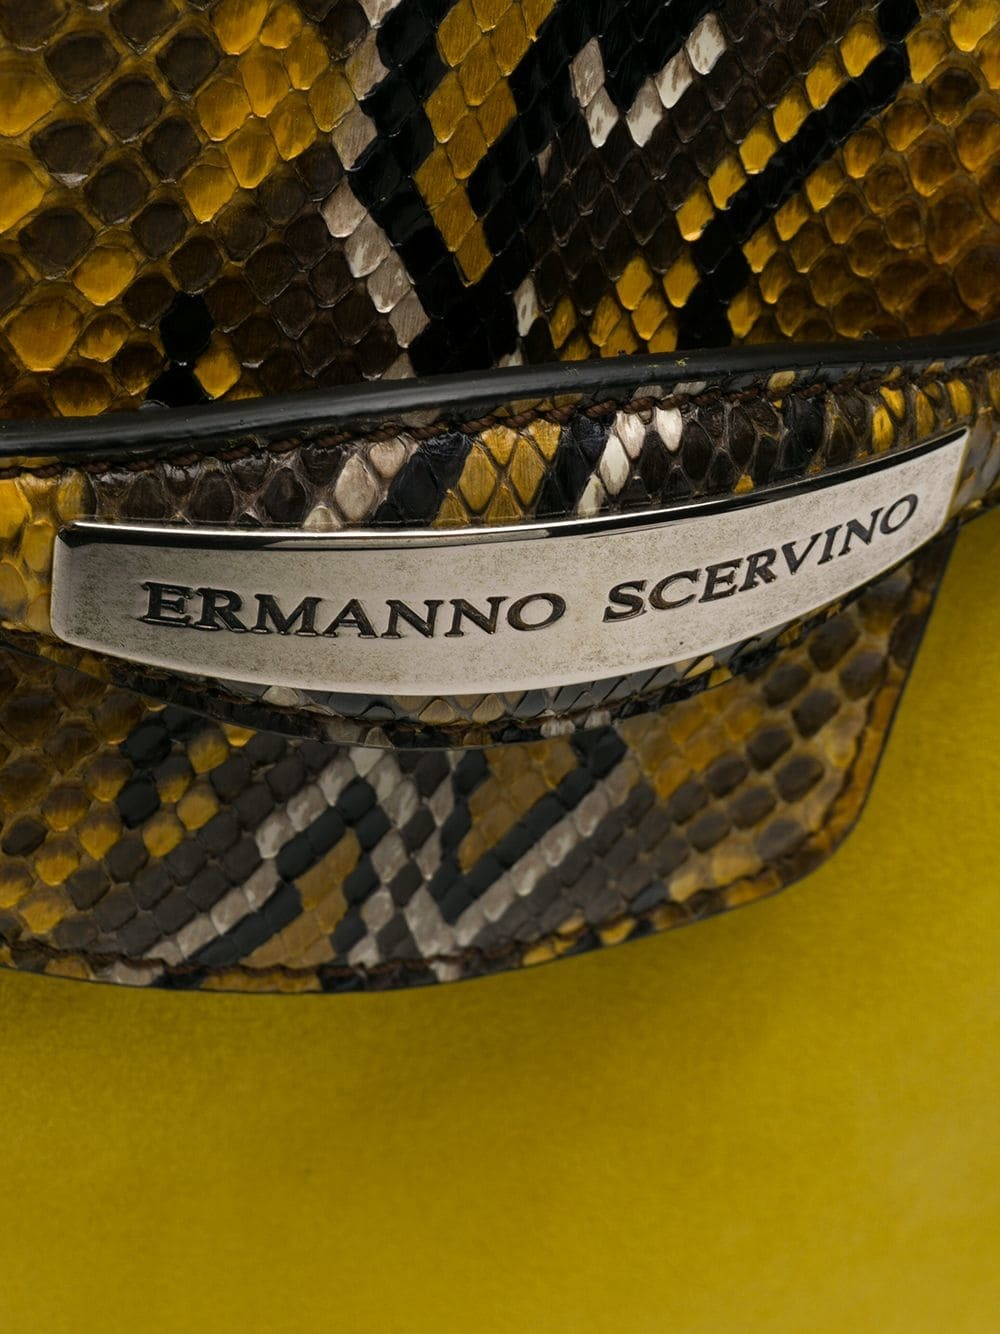 cuir jaune en Ermanno Cartable Scervino SVqUpMz